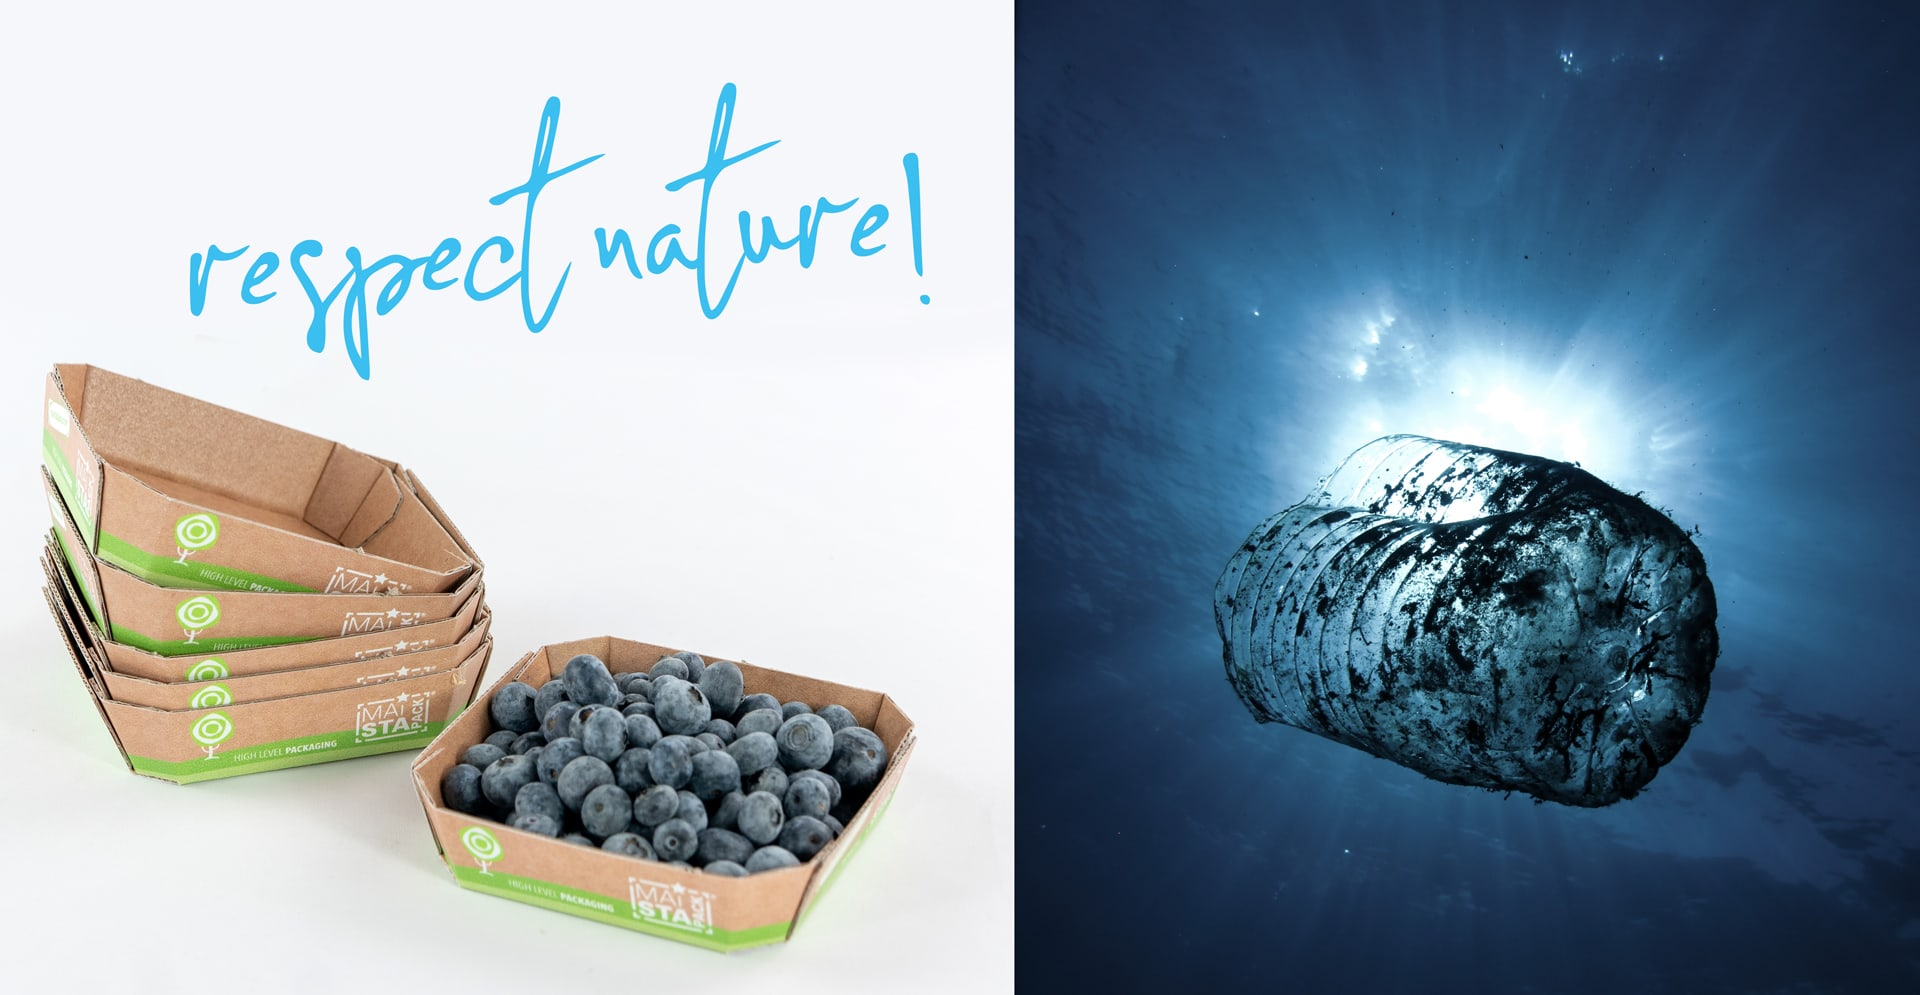 respect nature Karton statt Plastik